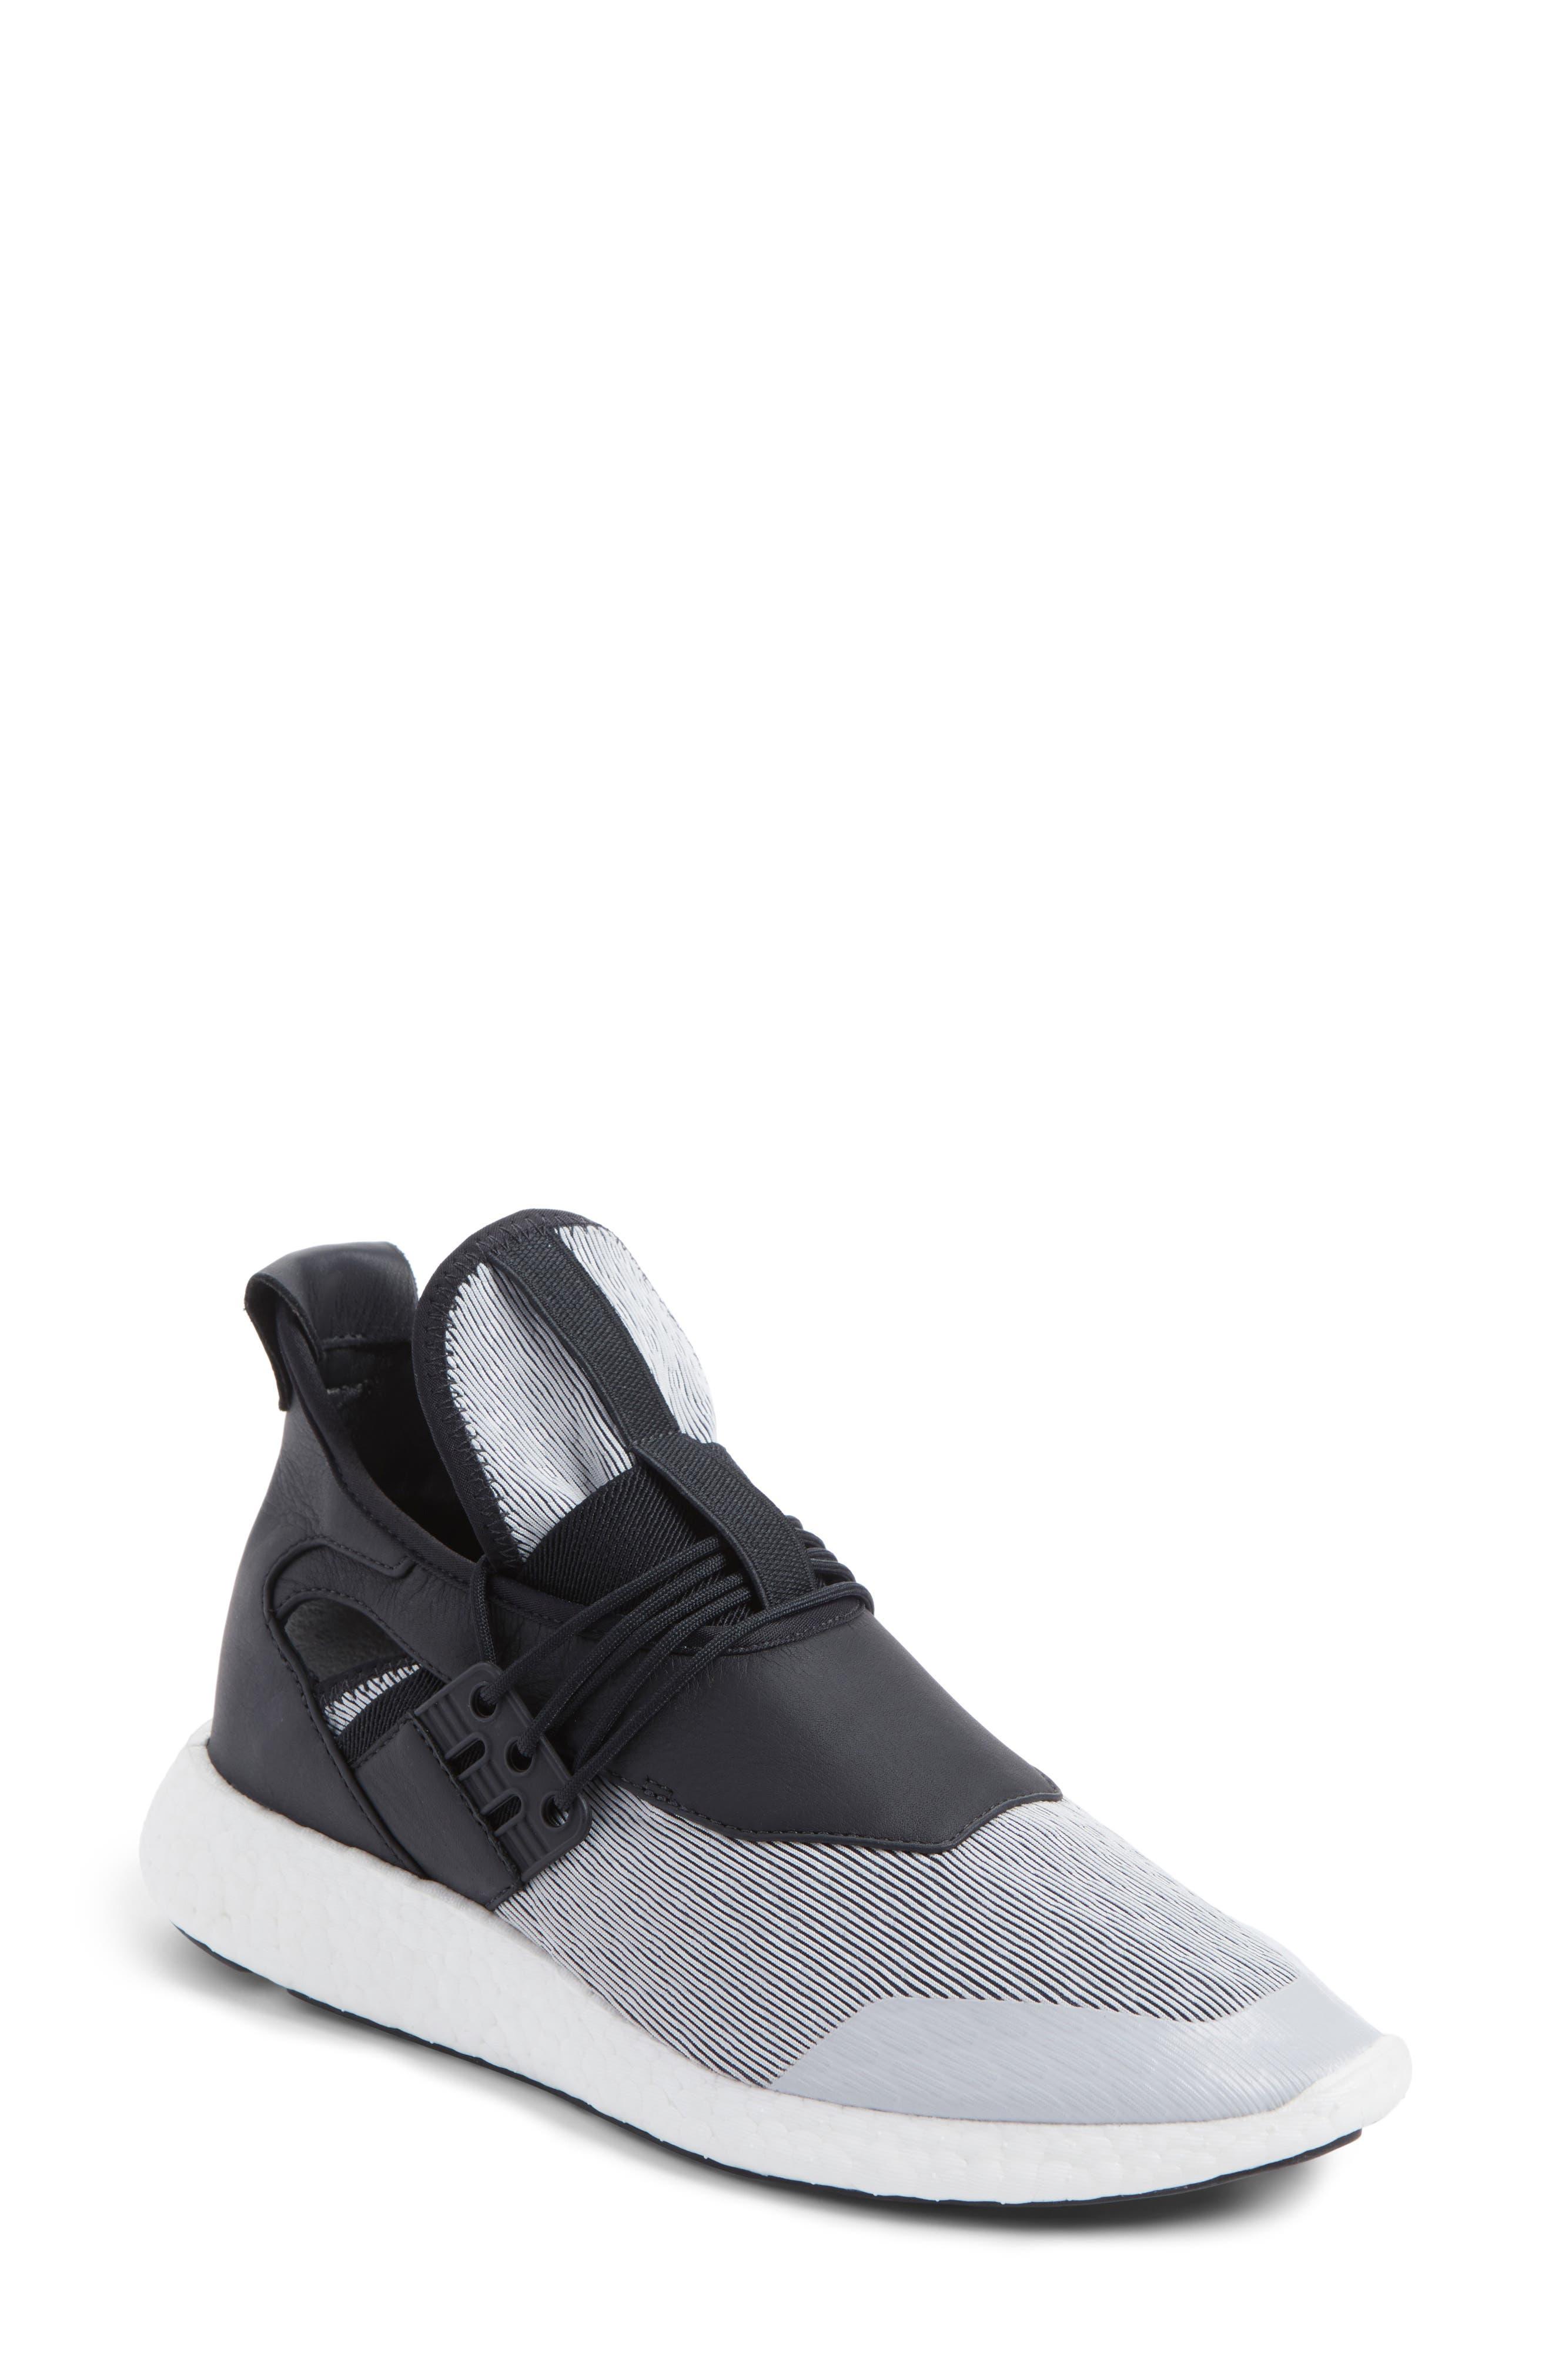 Elle Run Sneaker,                             Main thumbnail 1, color,                             021